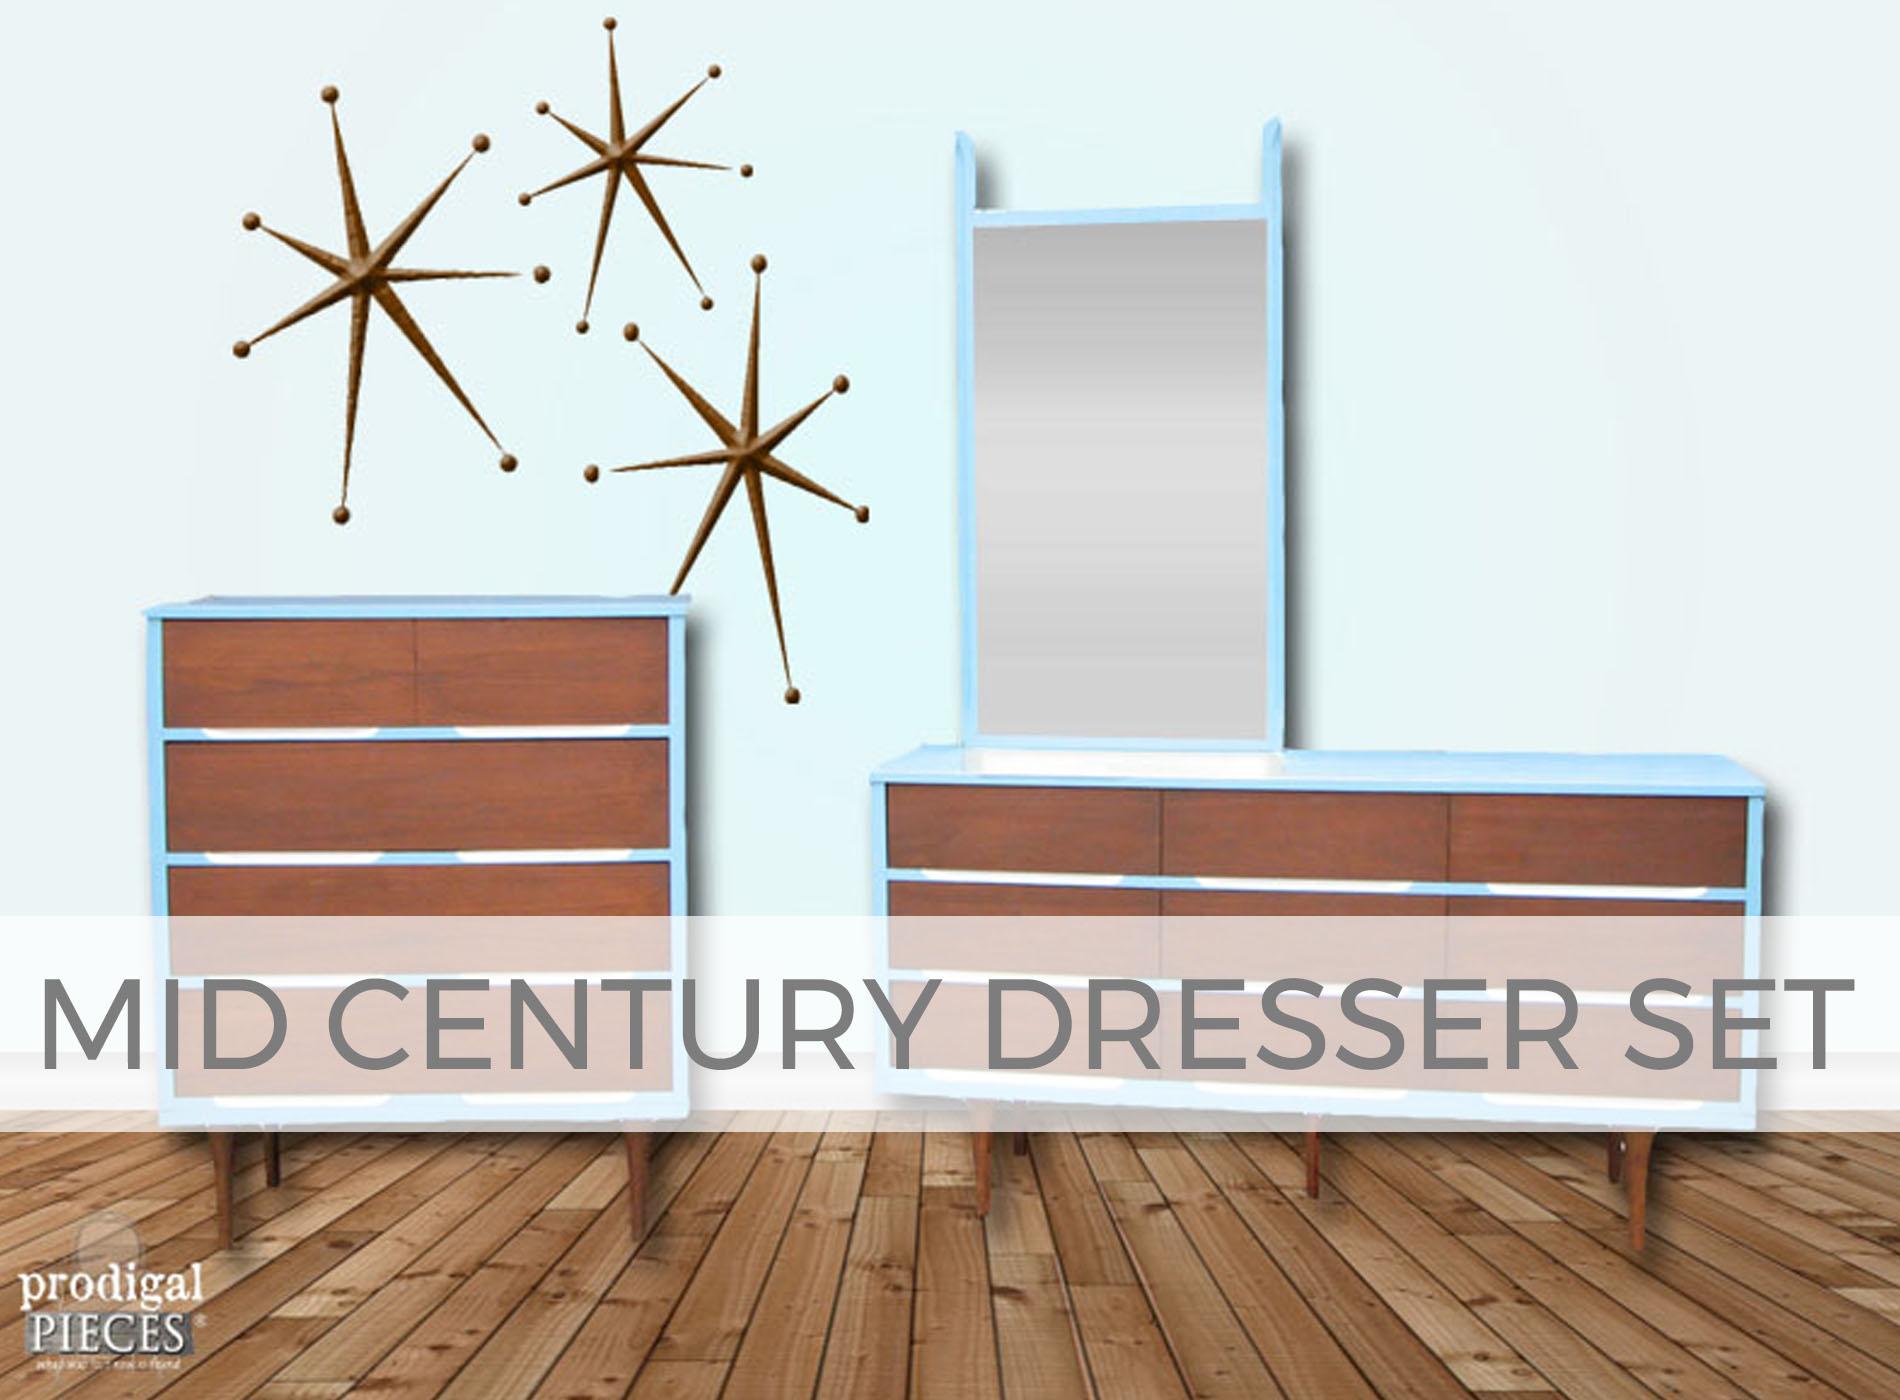 Mid Century Modern Dresser Set by Larissa of Prodigal Pieces | prodigalpieces.com